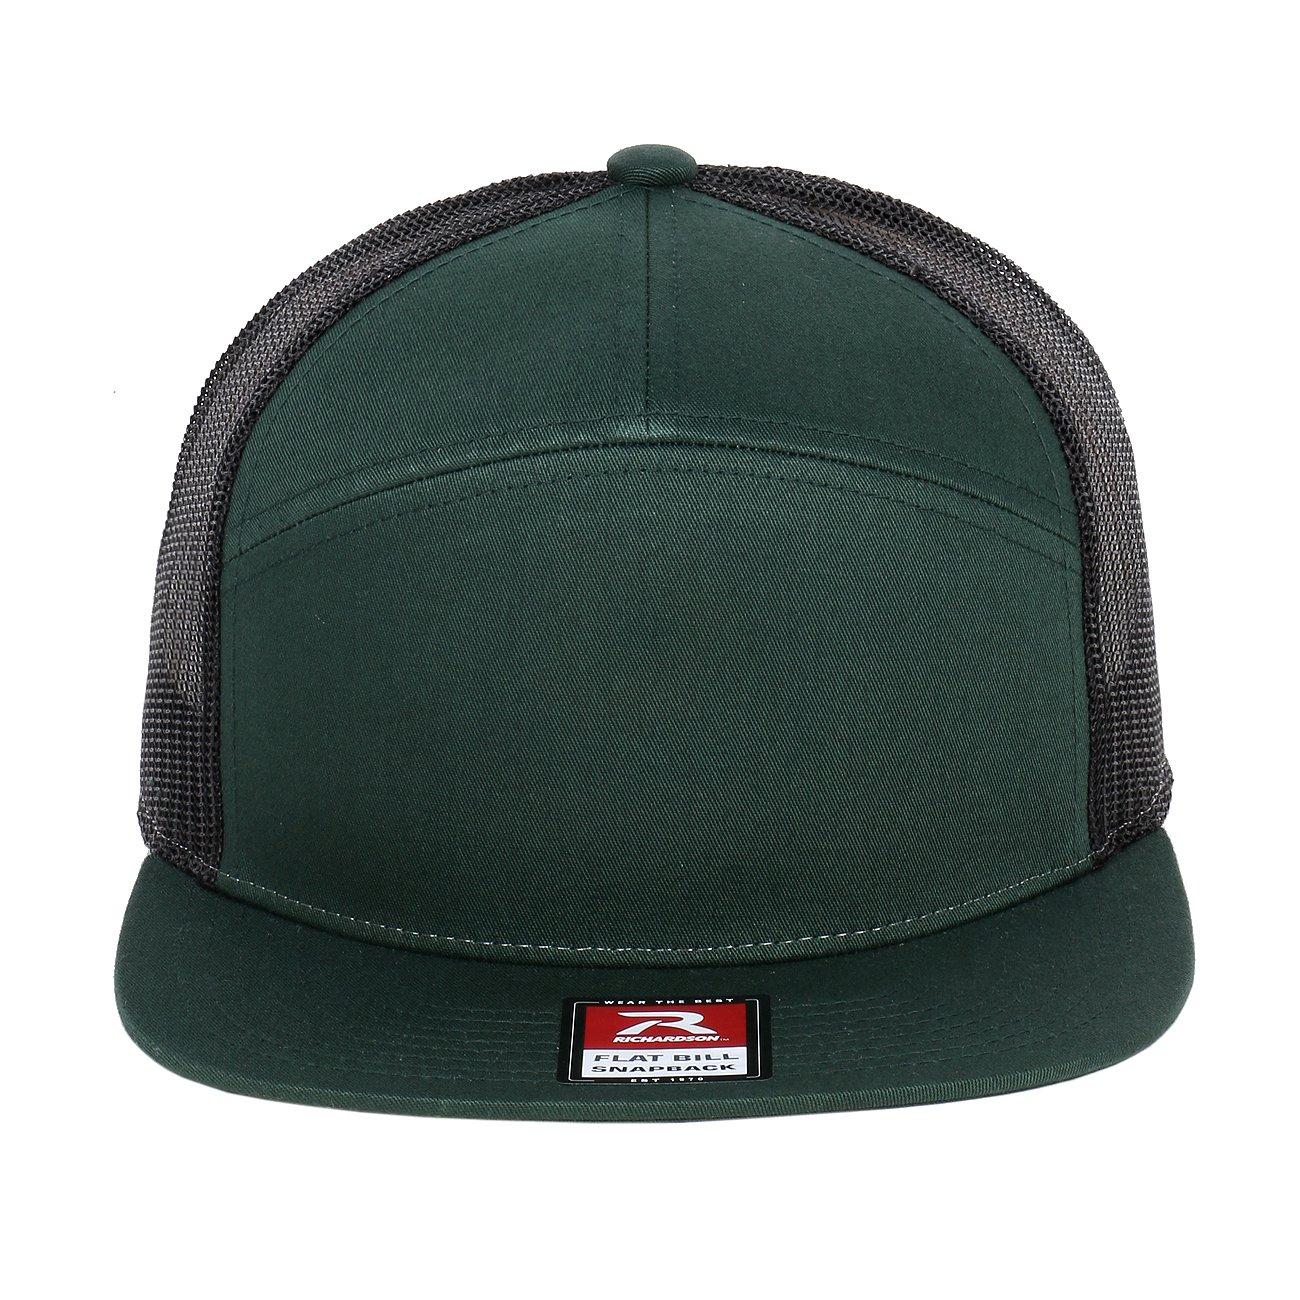 d8171ae3aa409 Richardson 7 Panel Arch Flat Bill Snapback Mesh Trucker Hat (Red-Black) at  Amazon Men s Clothing store